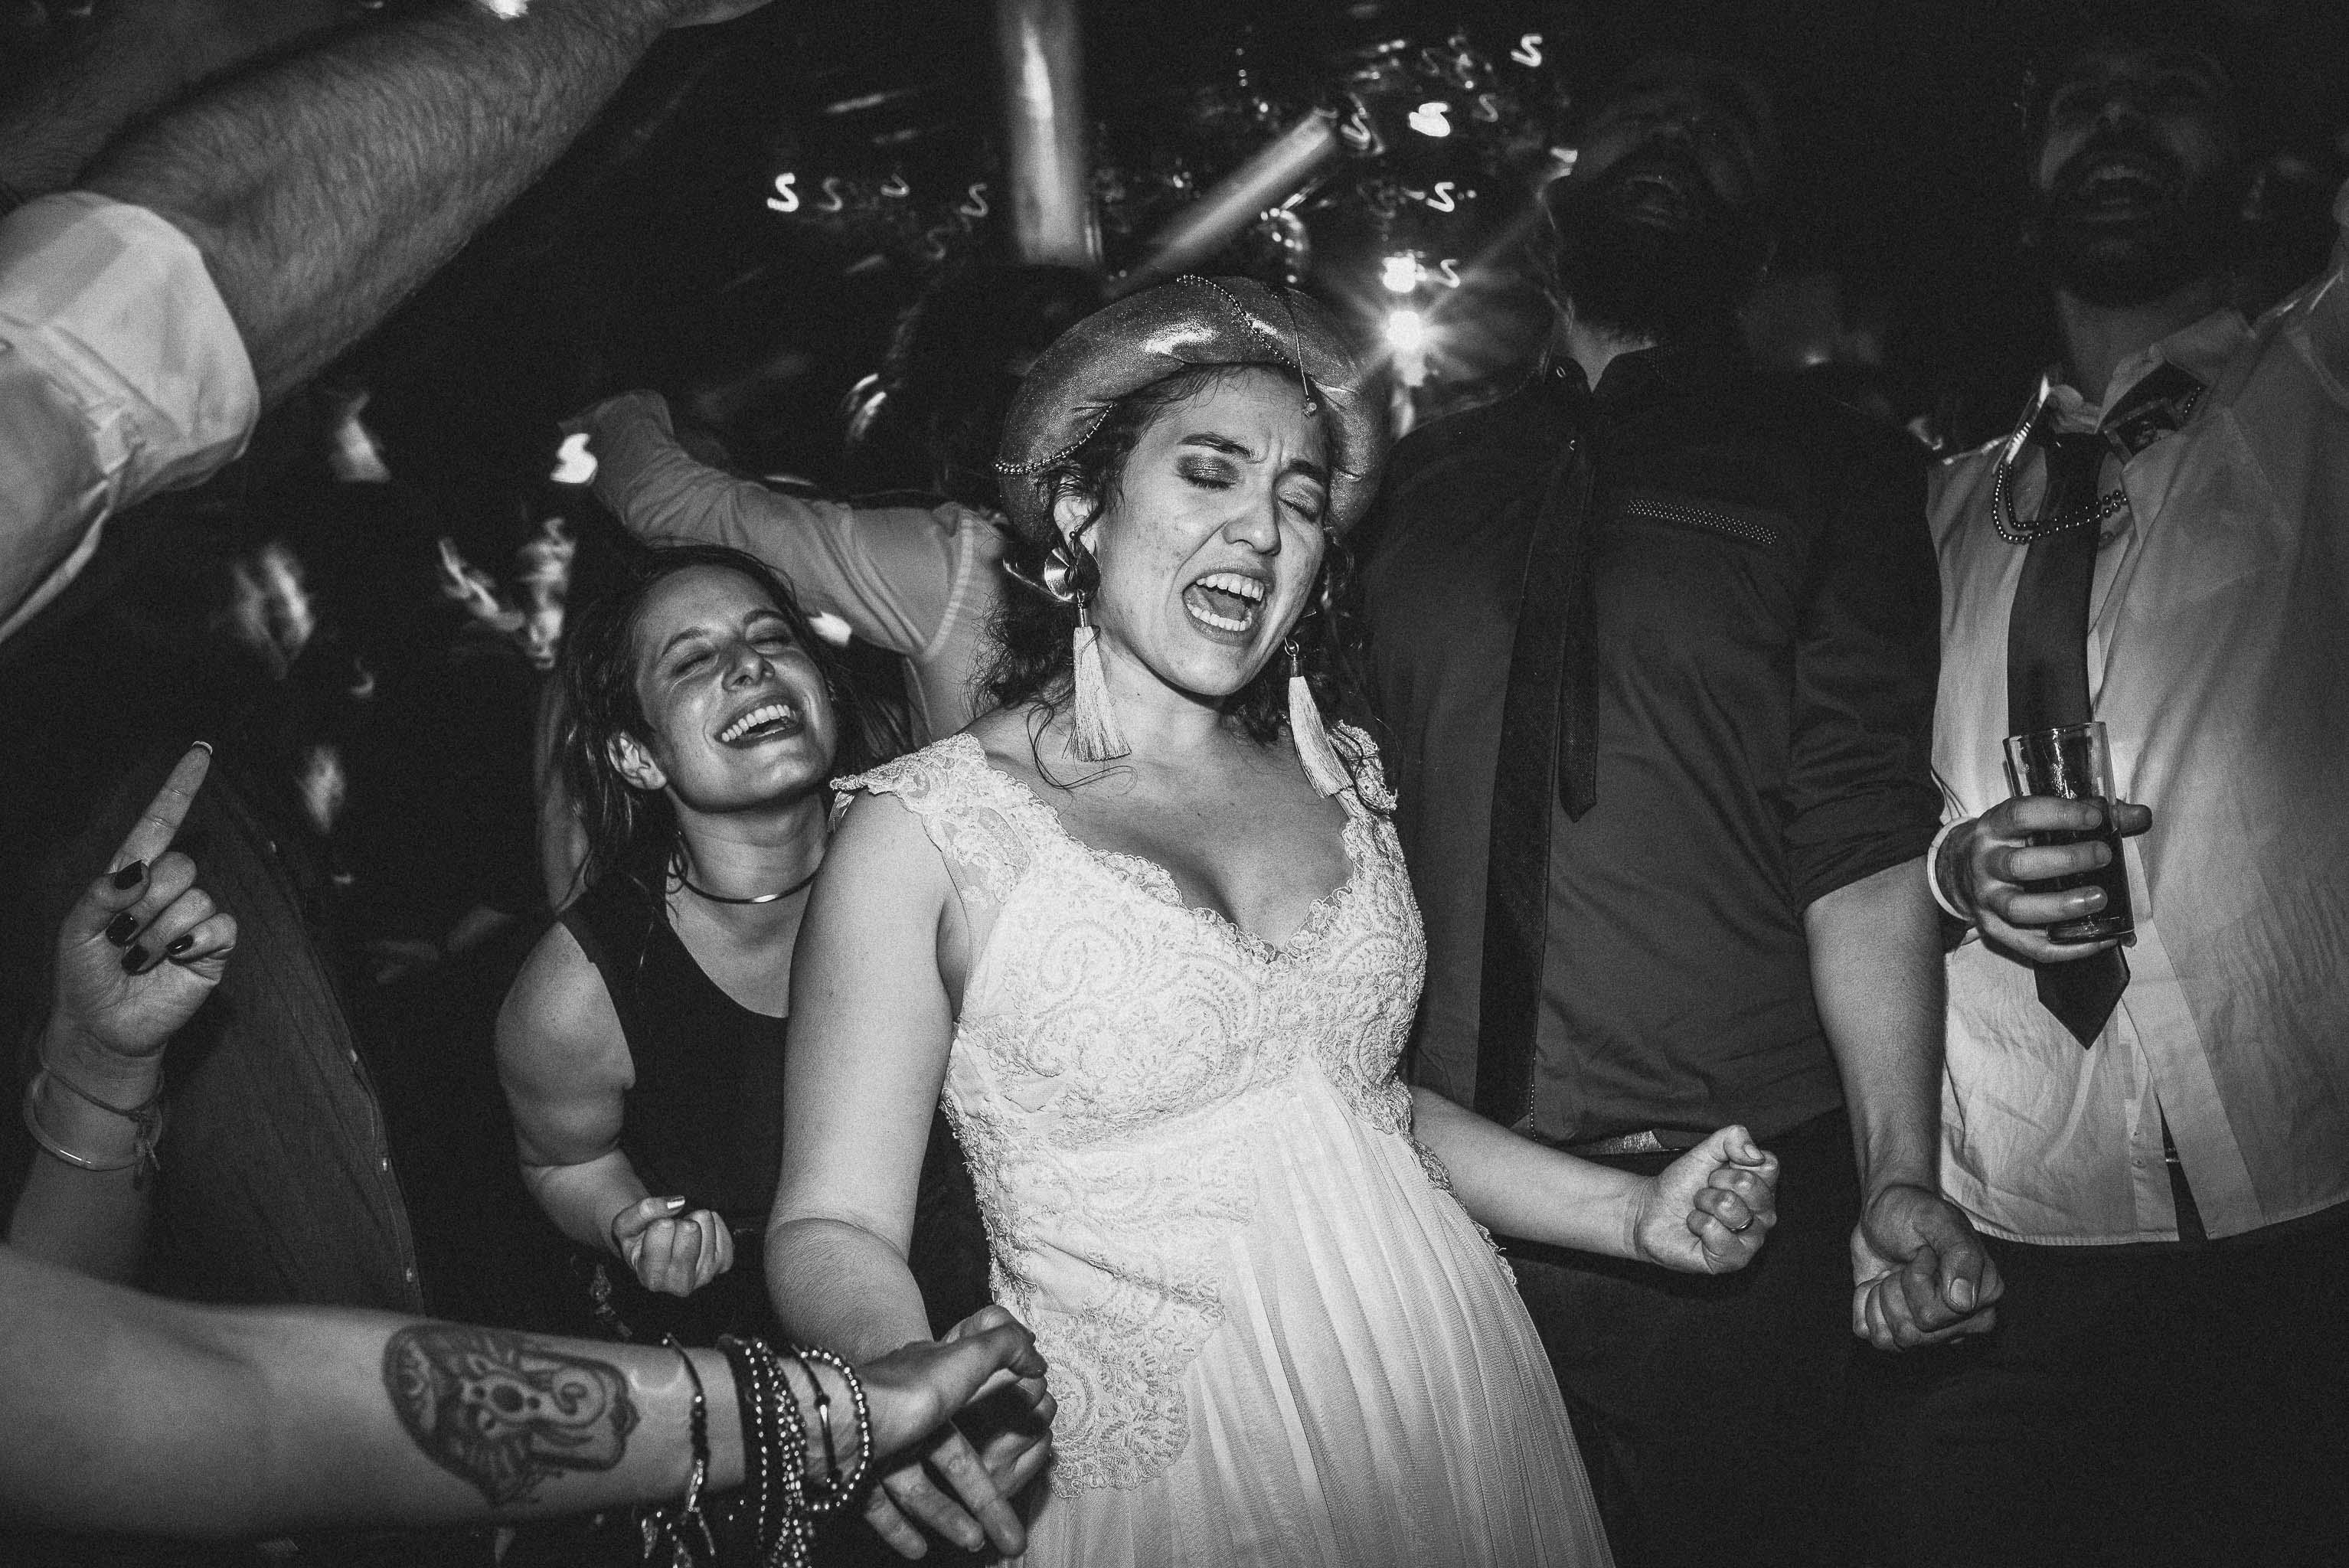 matrimonio-ko eventos-fiesta-novios